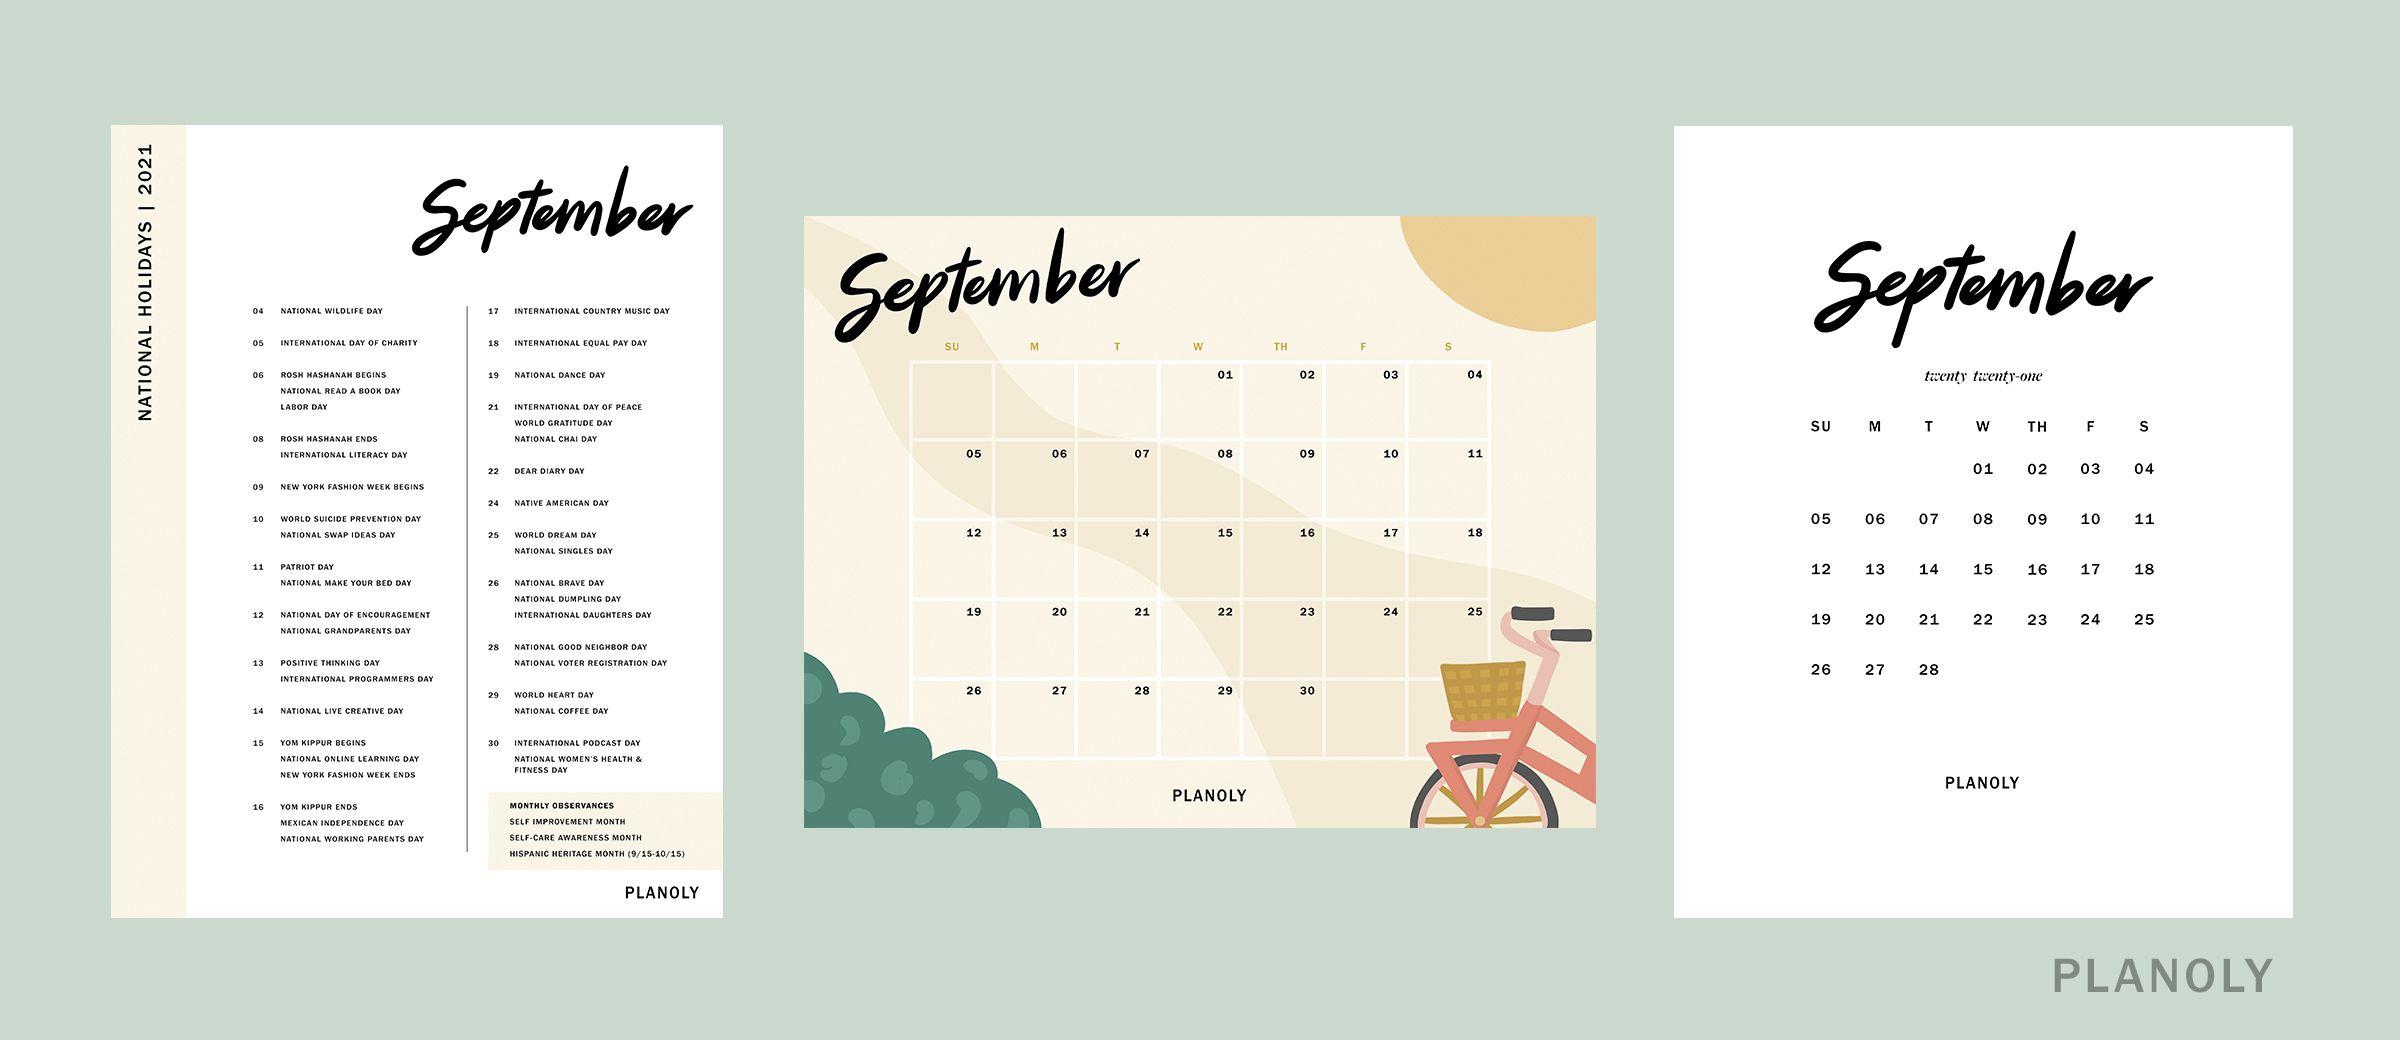 PLANOLY-Blog Post-Q3 Content Calendars-Image 3